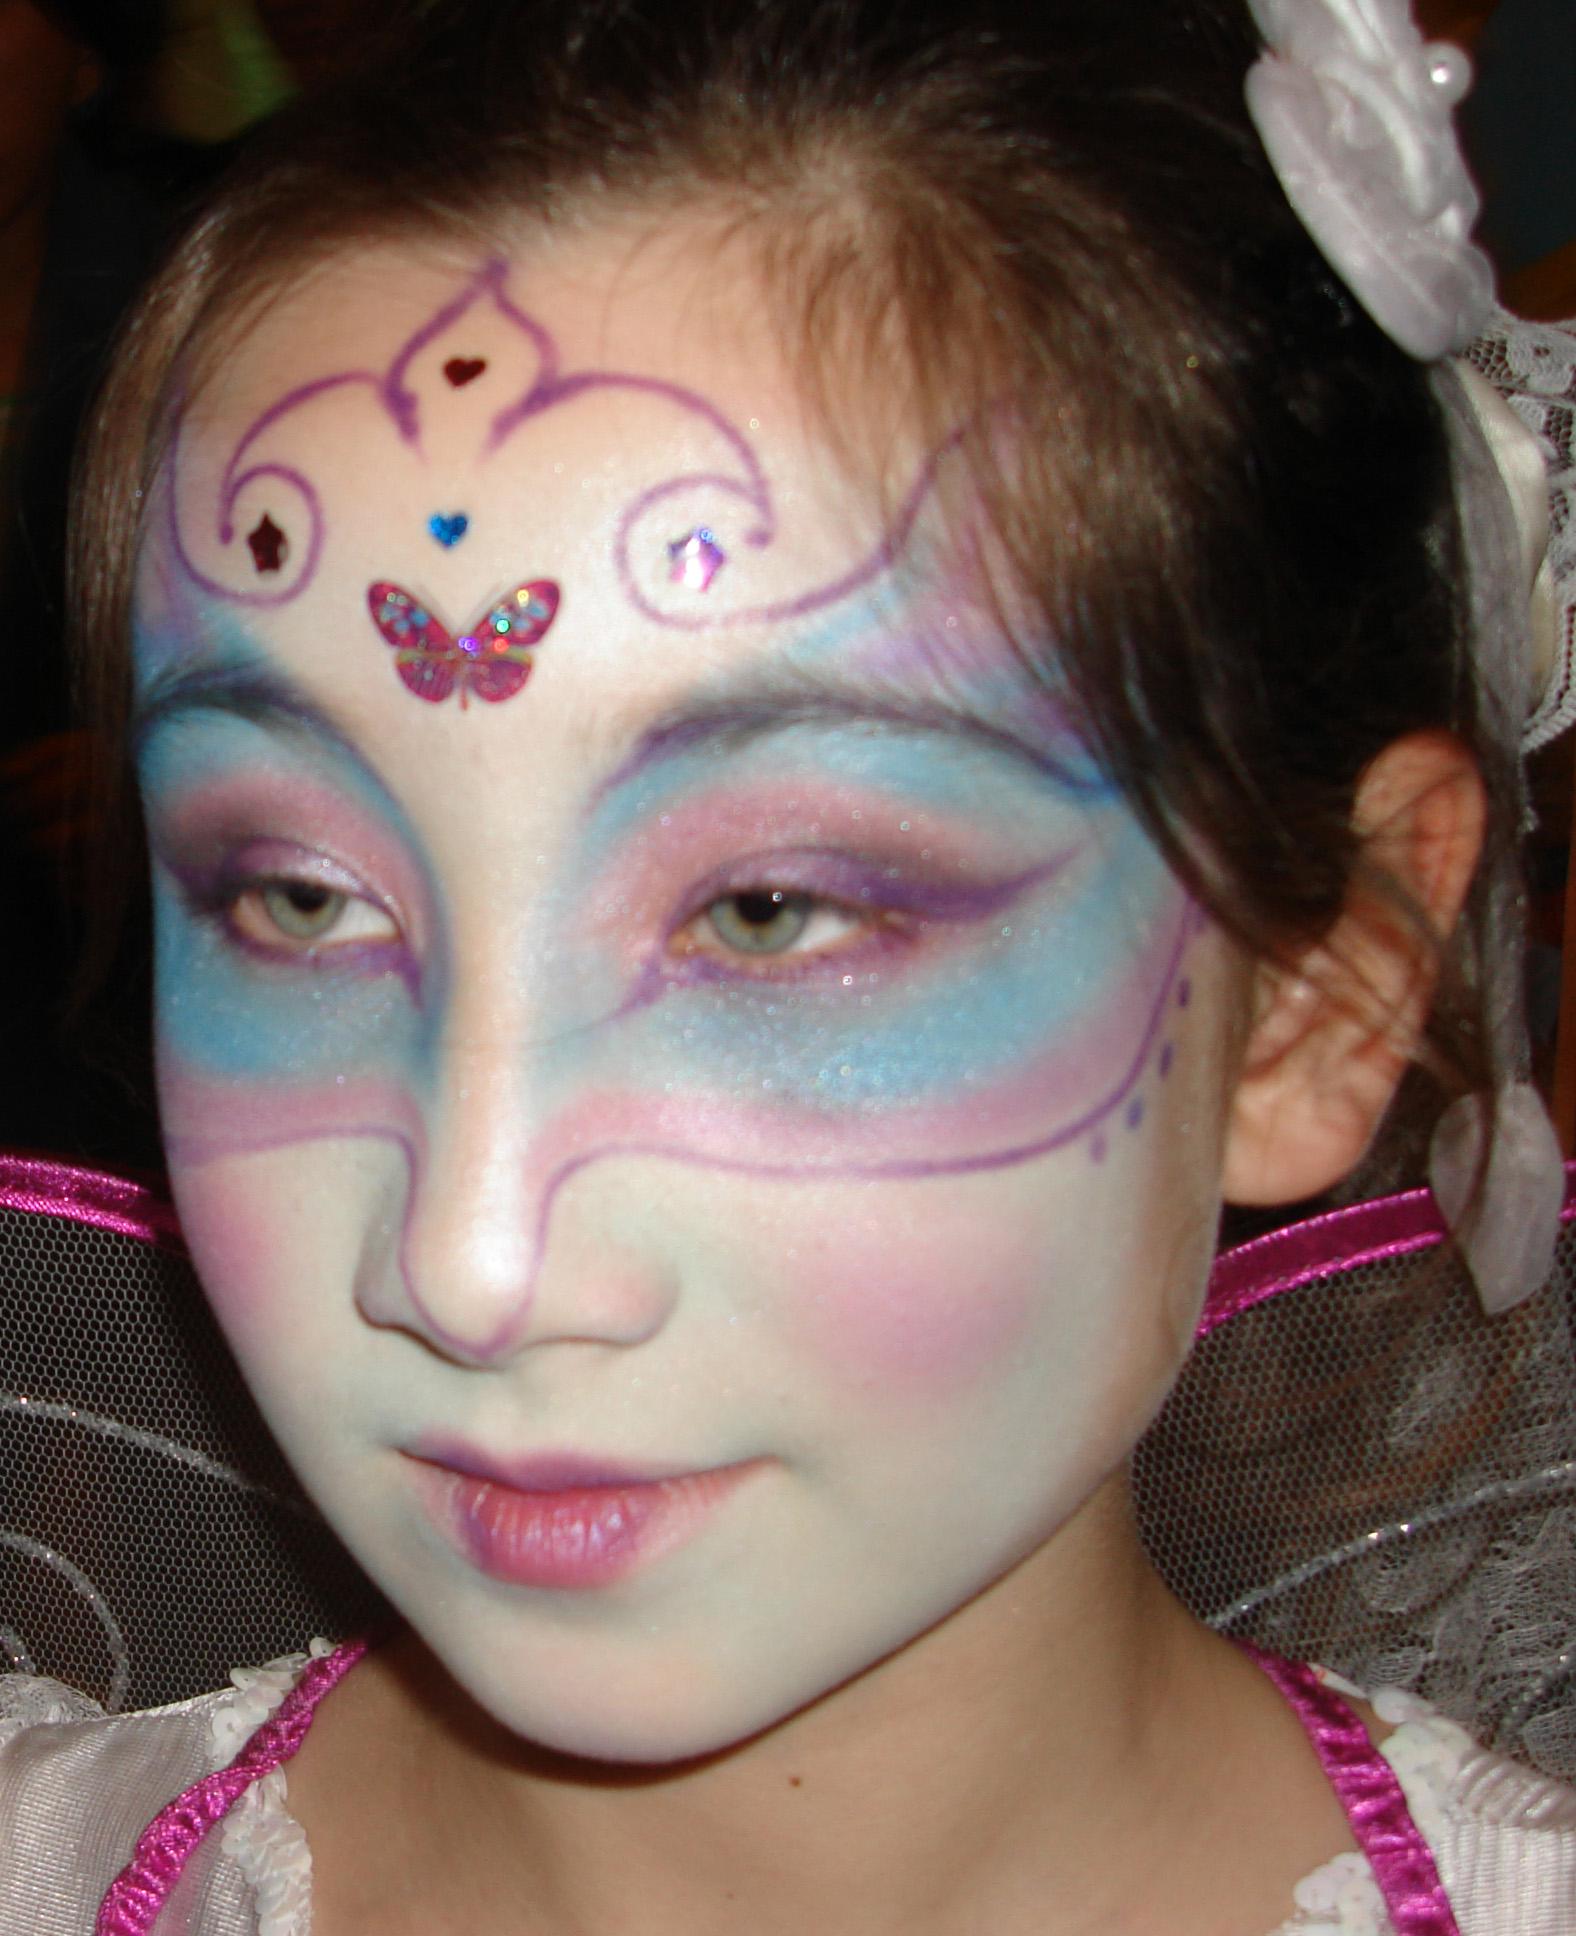 Blysse on Halloween 2007